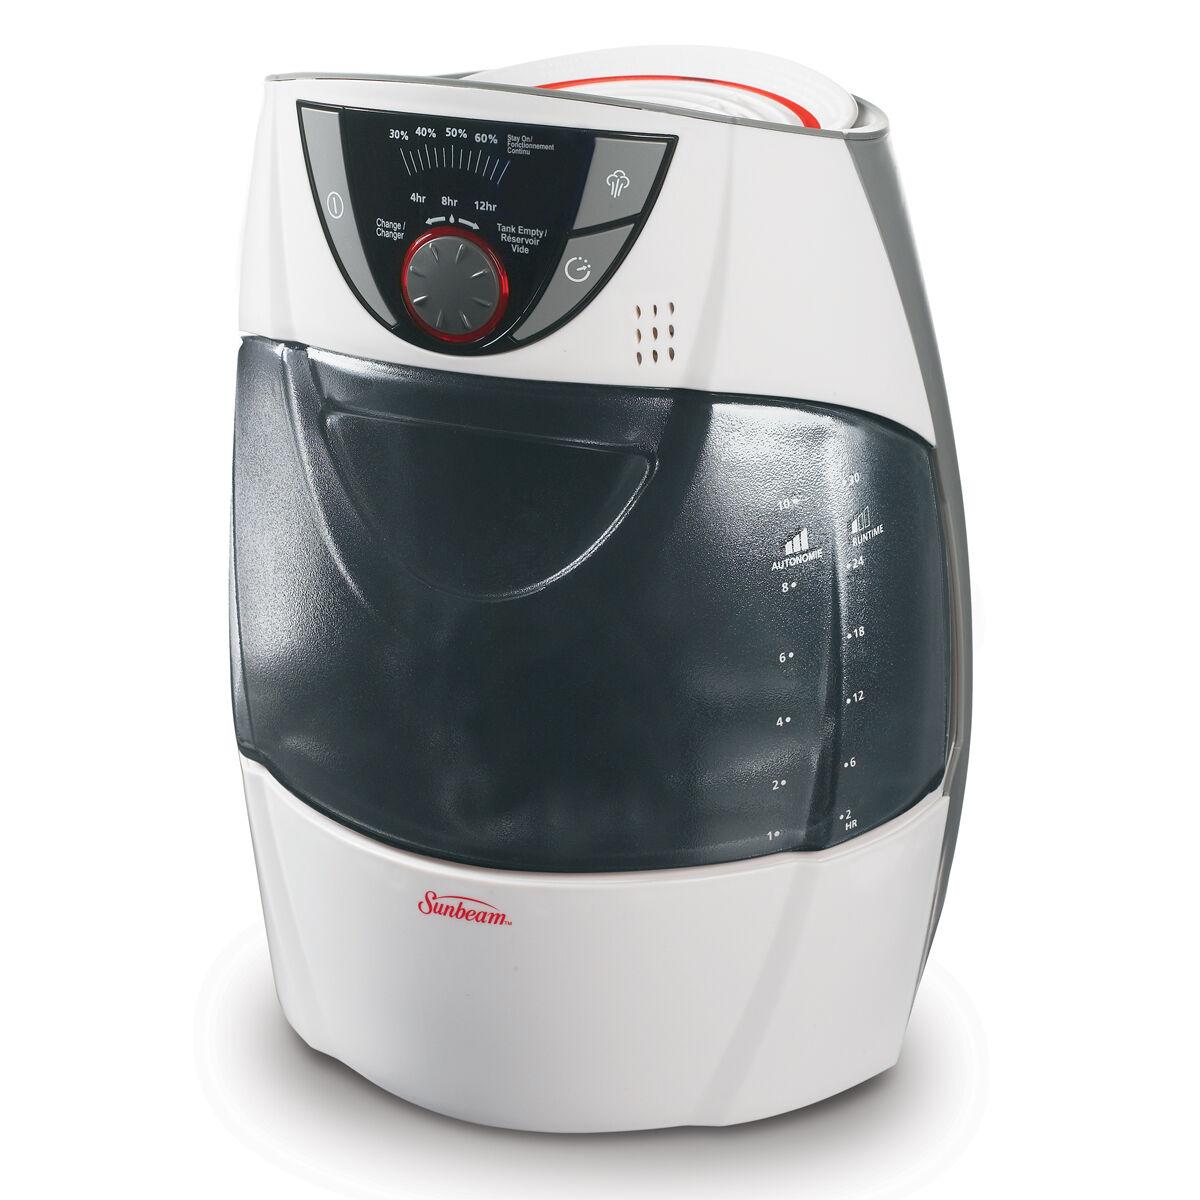 Sunbeam Warm Mist Humidifier Manual User Manual Guide